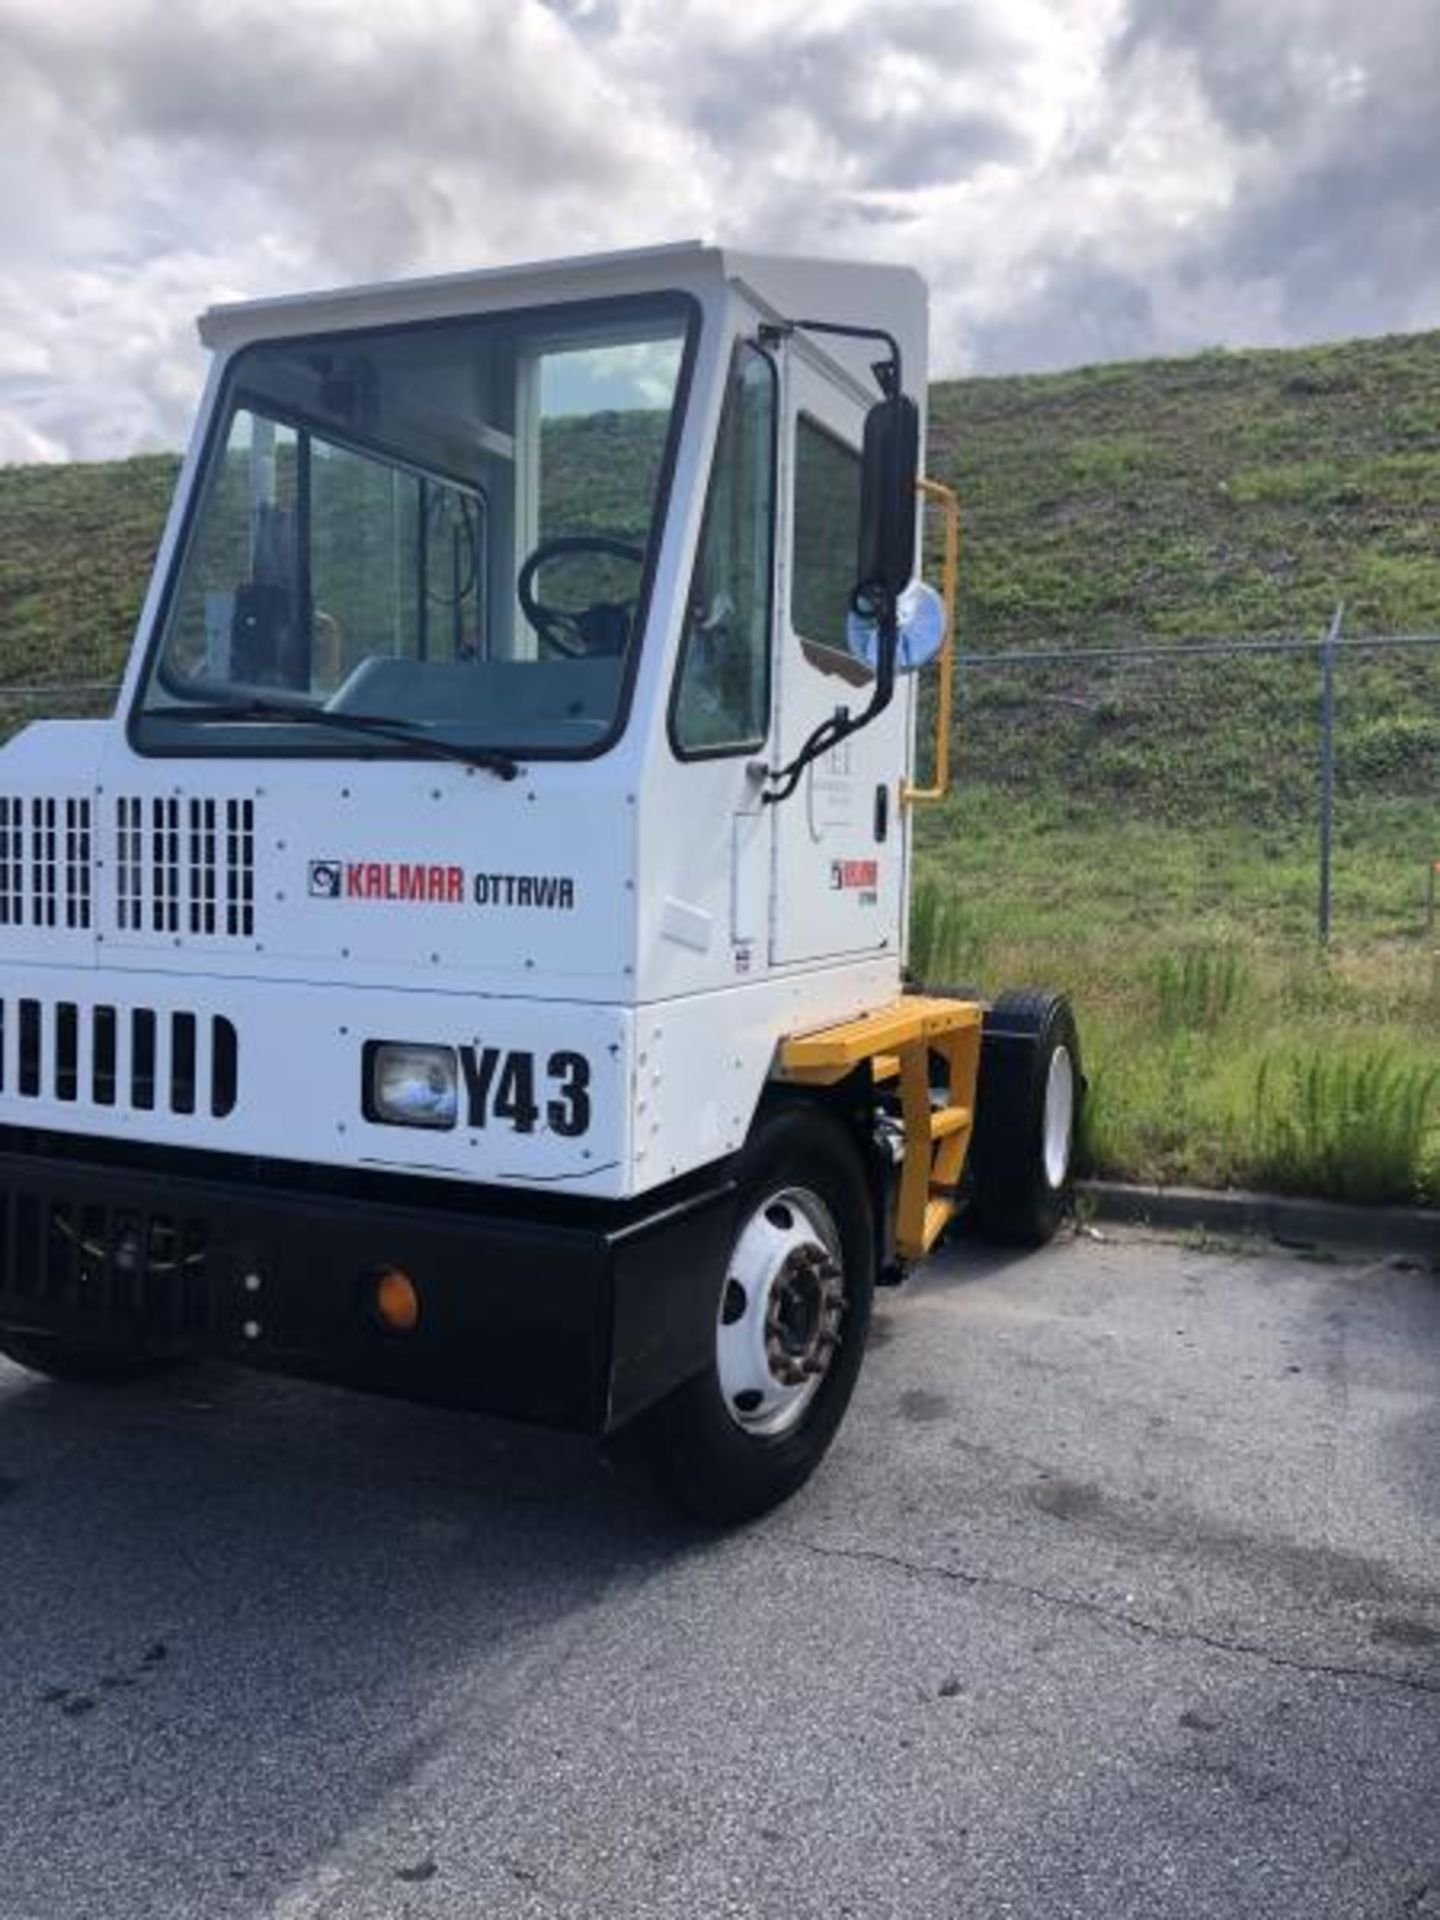 2015 Kalmar Ottawa 4x2 Yard Truck , SN: 338837 3,239.3 Hours, 3,125 Miles